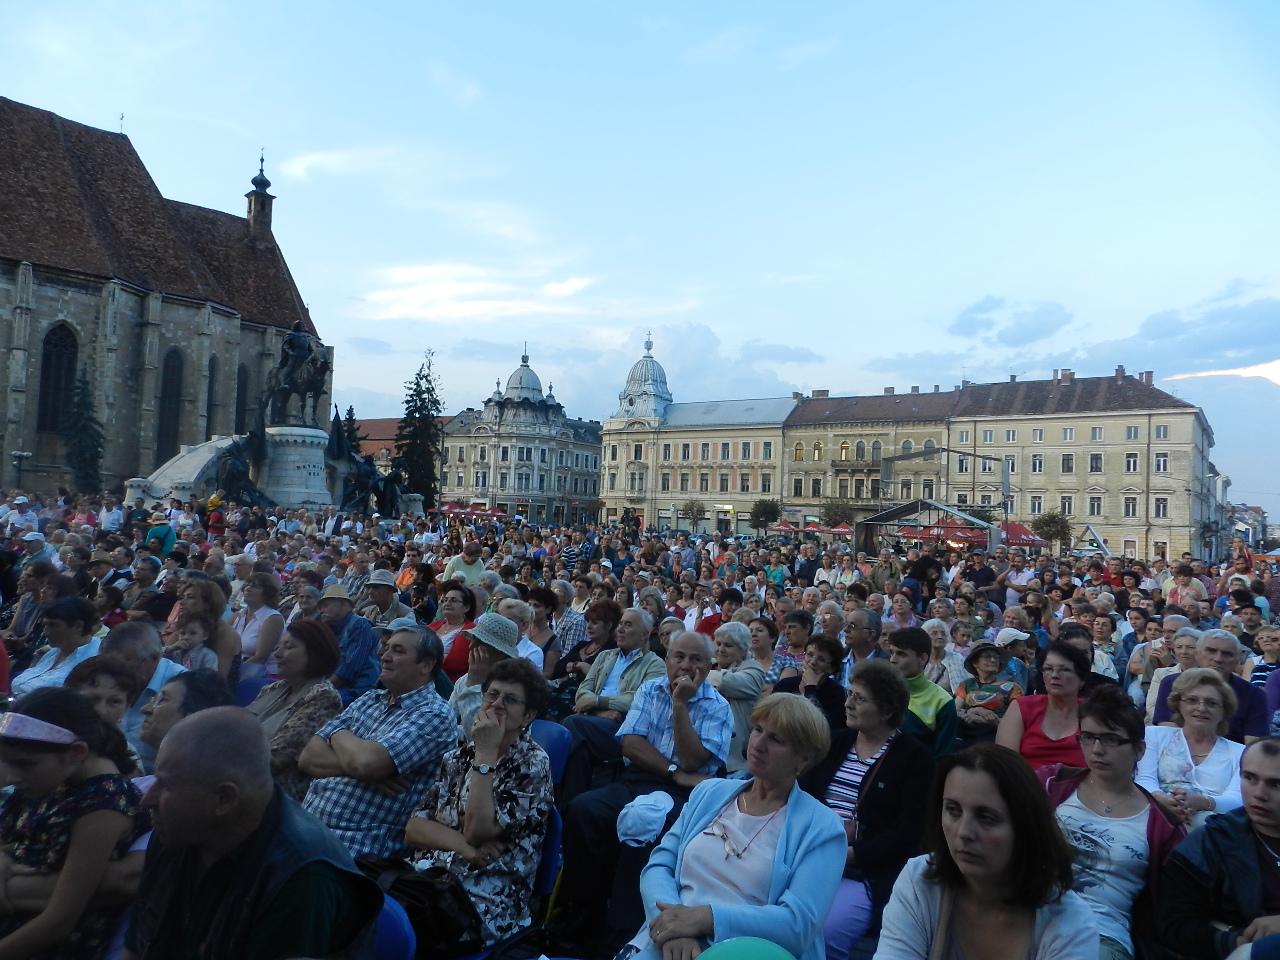 zilele maghiare 2014